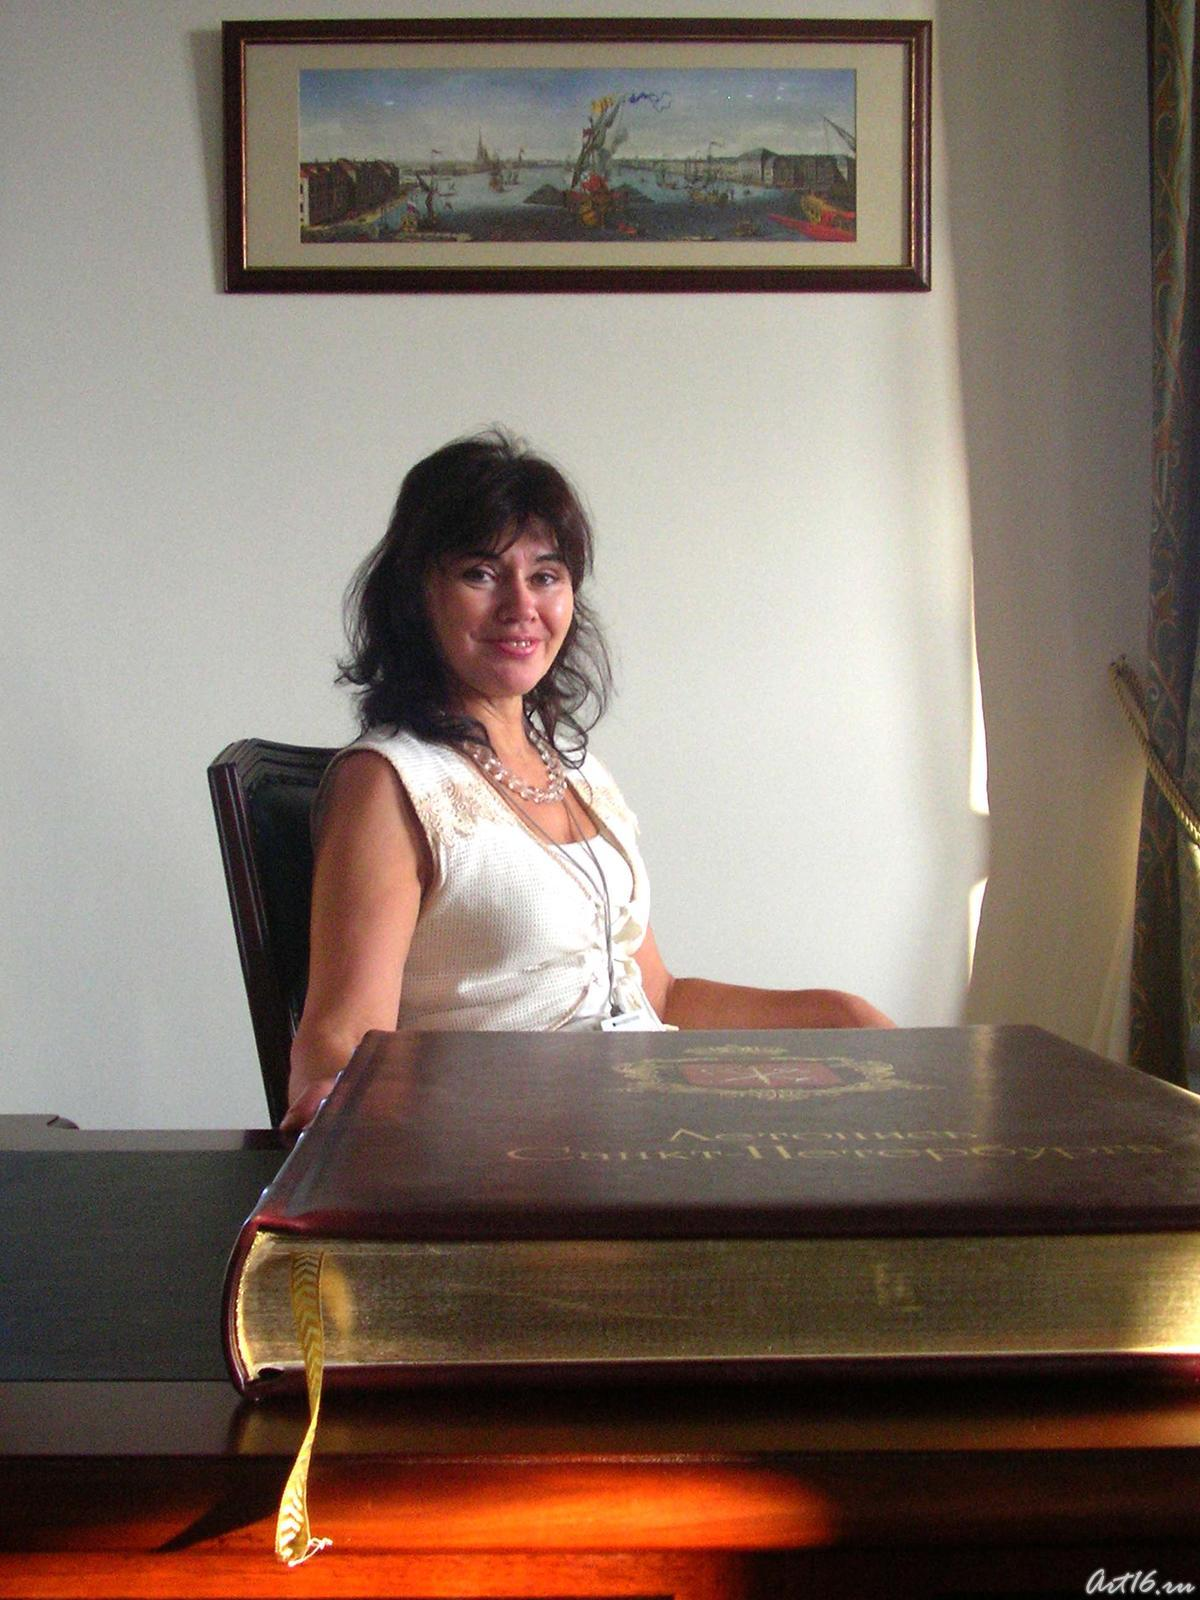 Фото №16654. За столом М.Б. Пиотровского